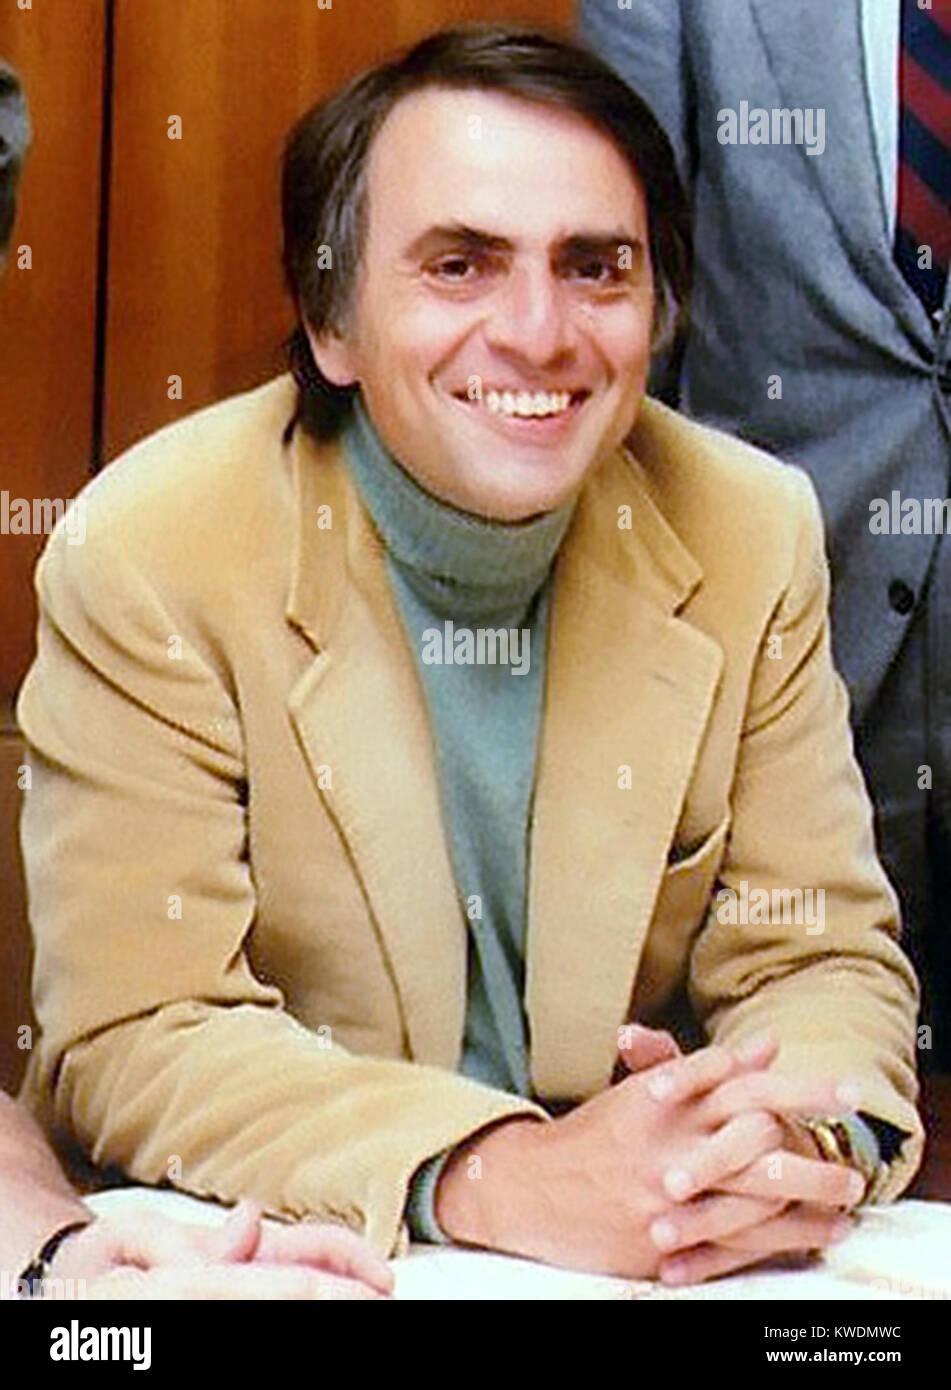 Carl Sagan, Carl Edward Sagan, American astronomer, cosmologist, astrophysicist, astrobiologist, author, science - Stock Image